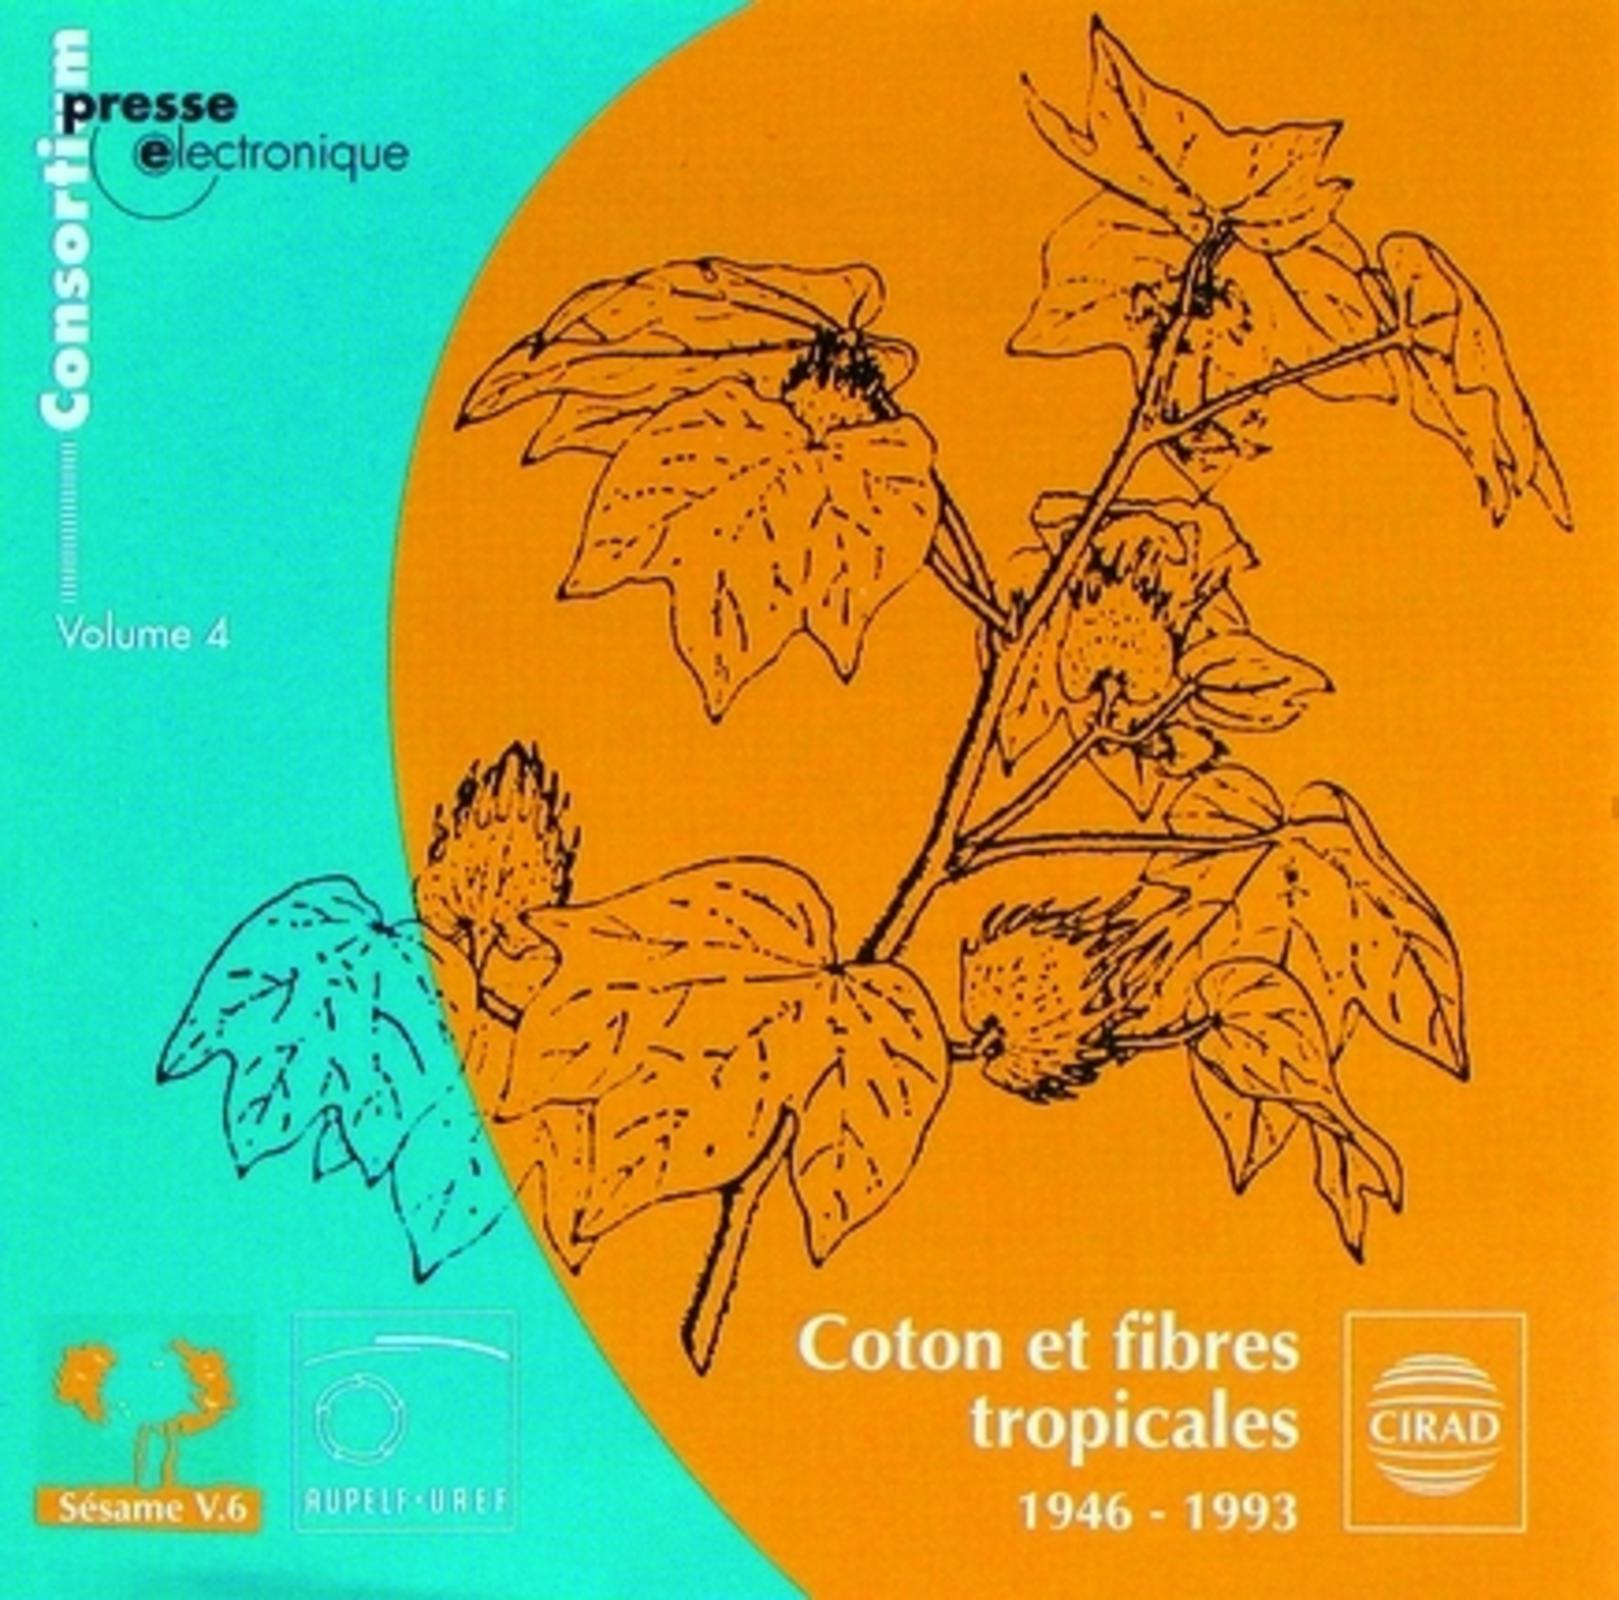 COTON ET FIBRES TROPICALES - V 4 - 1946-1993